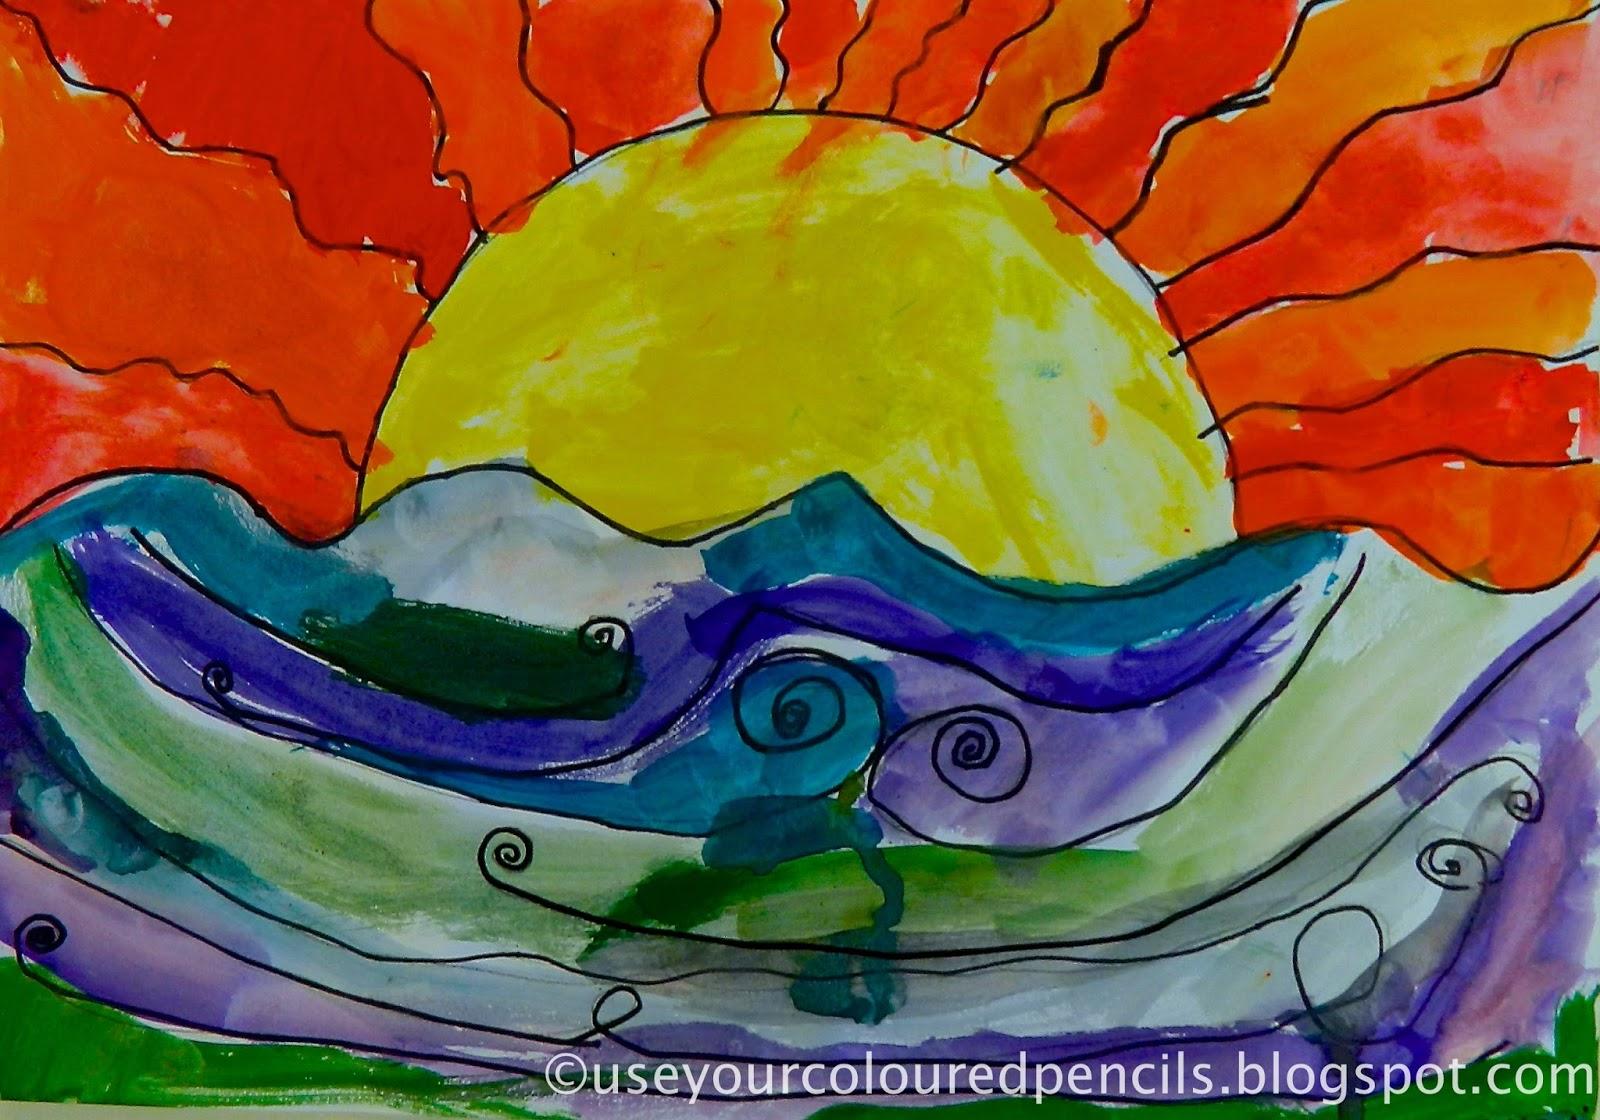 Use Your Coloured Pencils: Warm Sky, Cool Sea